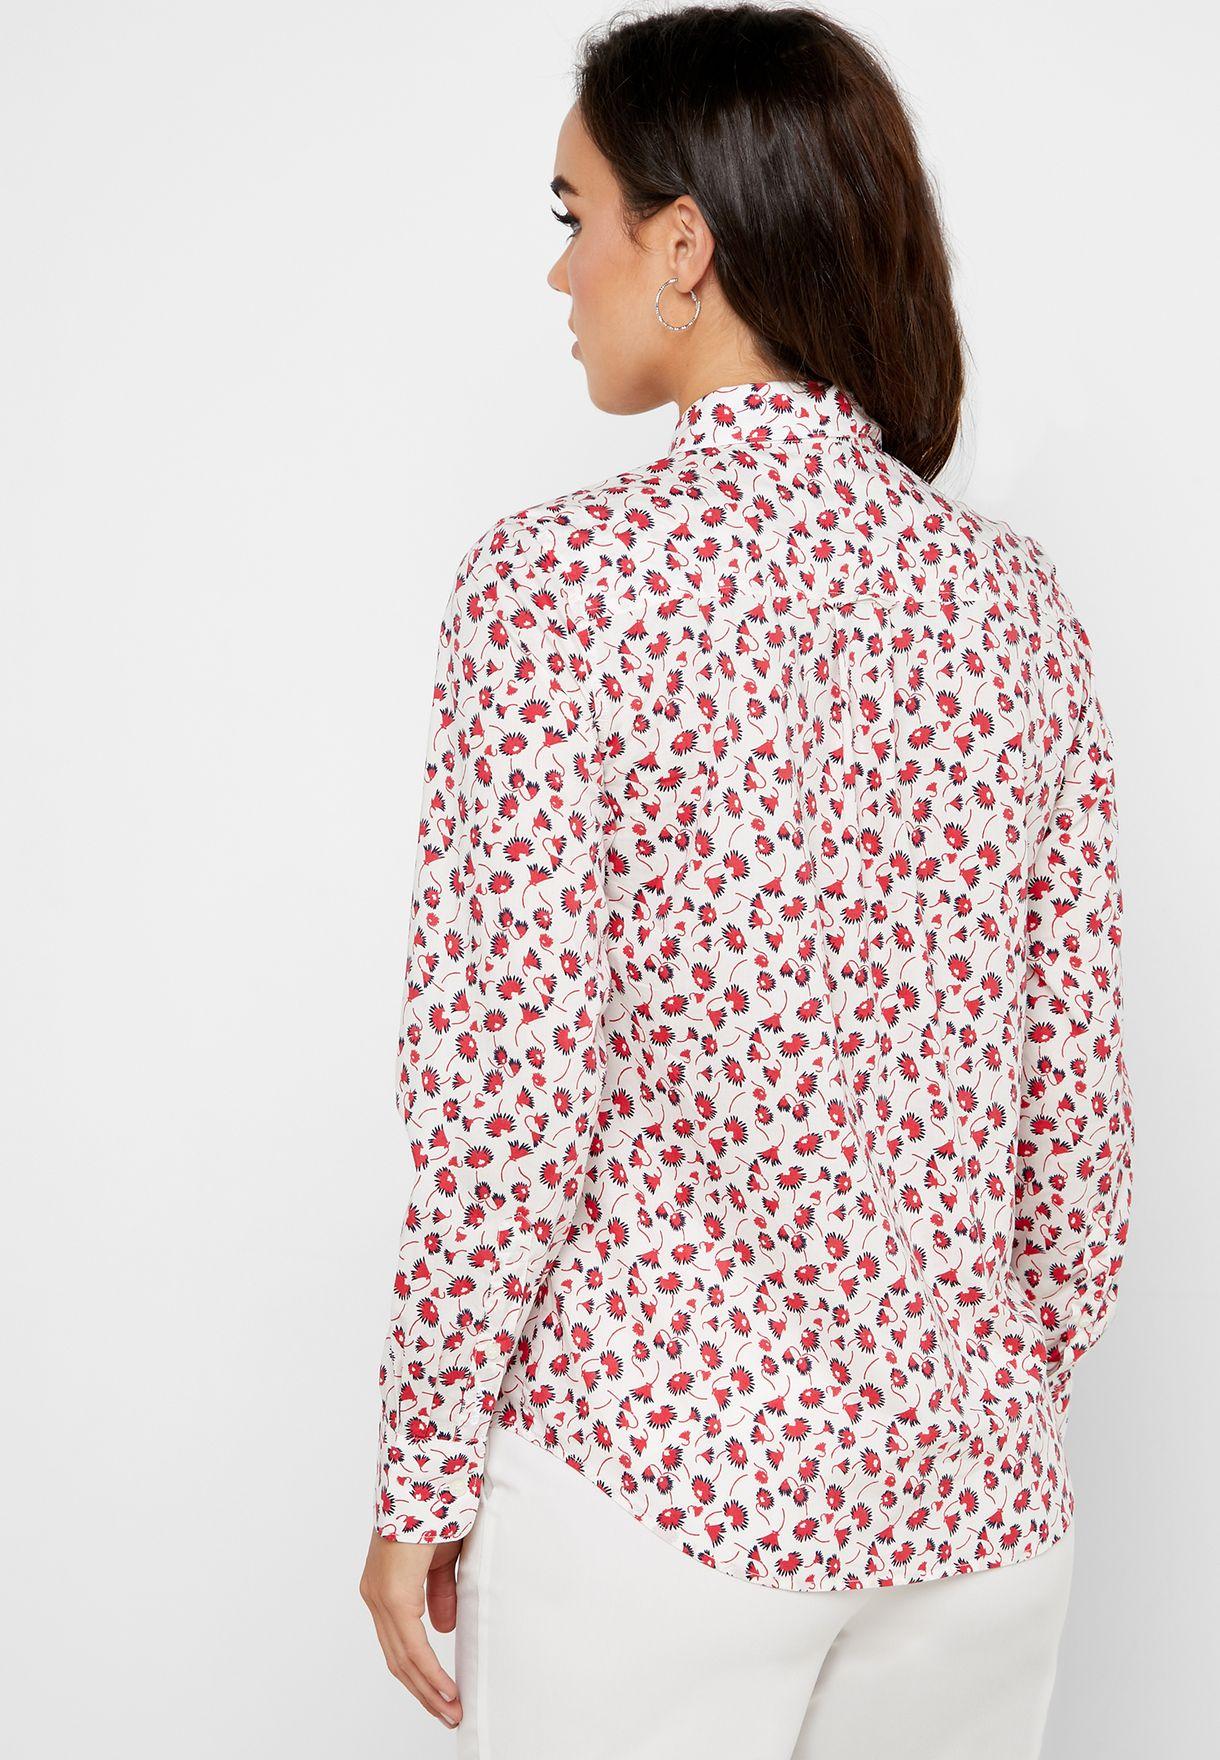 قميص بطبعات ازهار